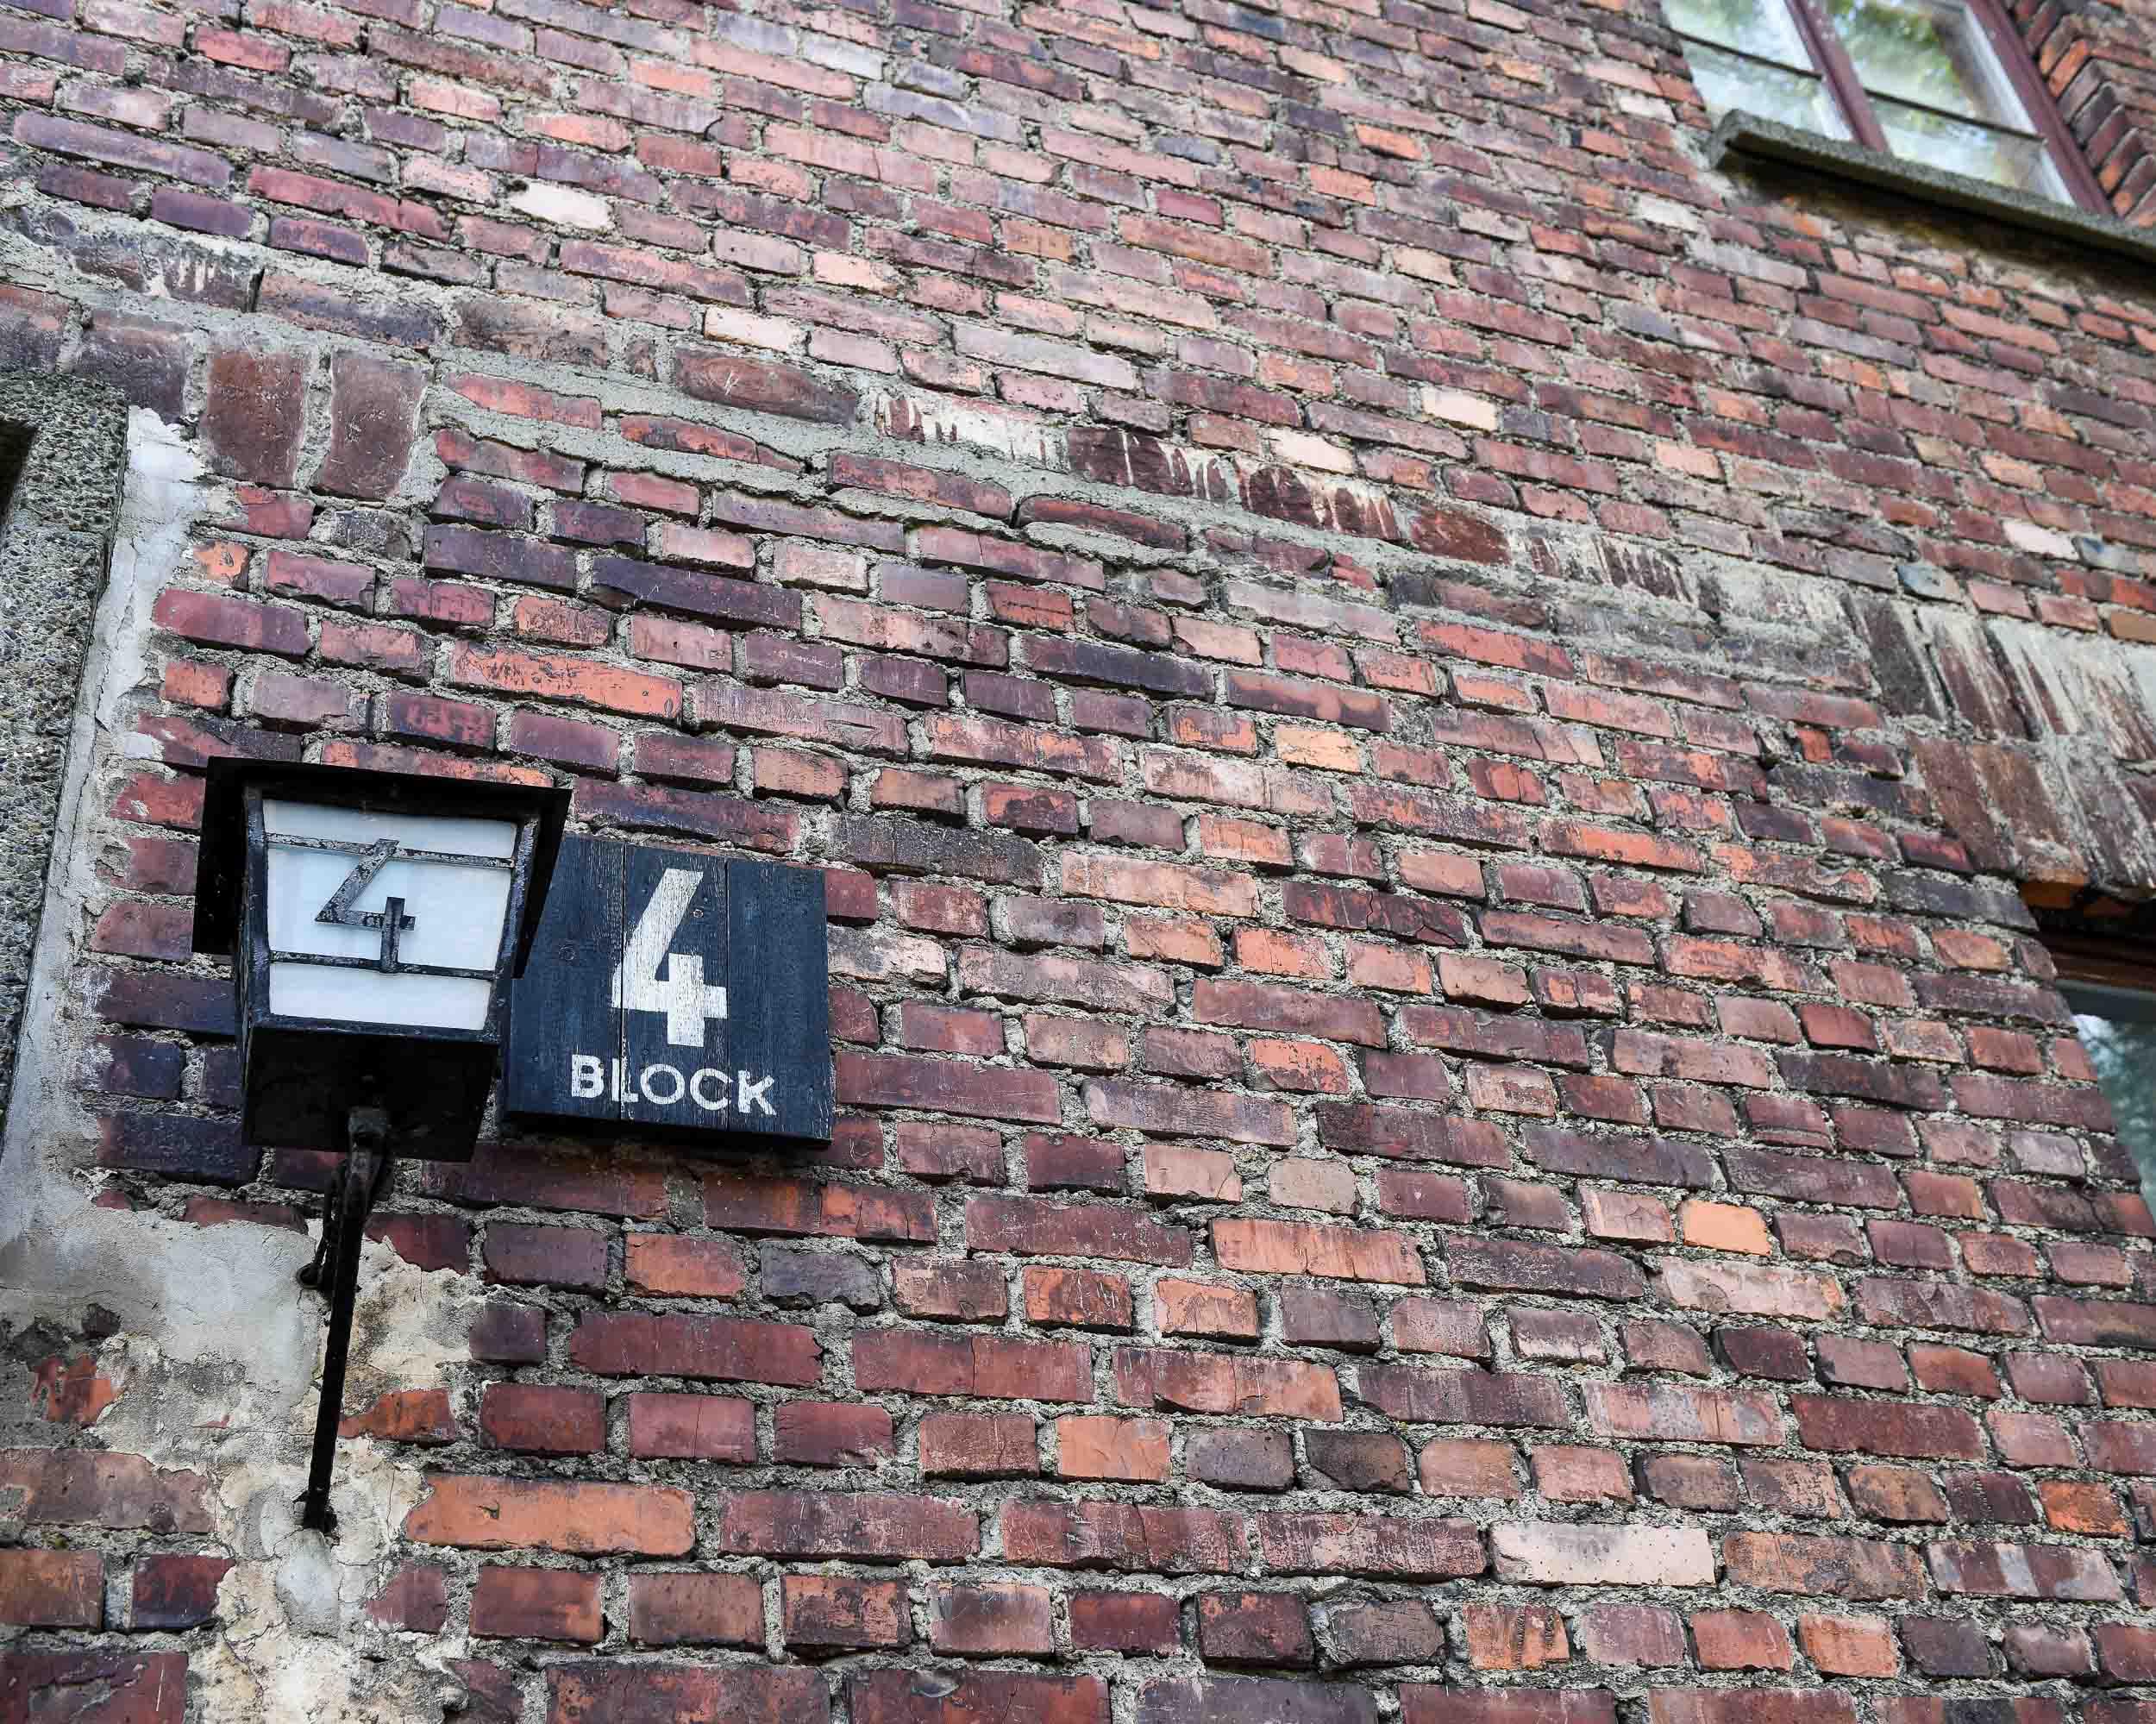 4 Block